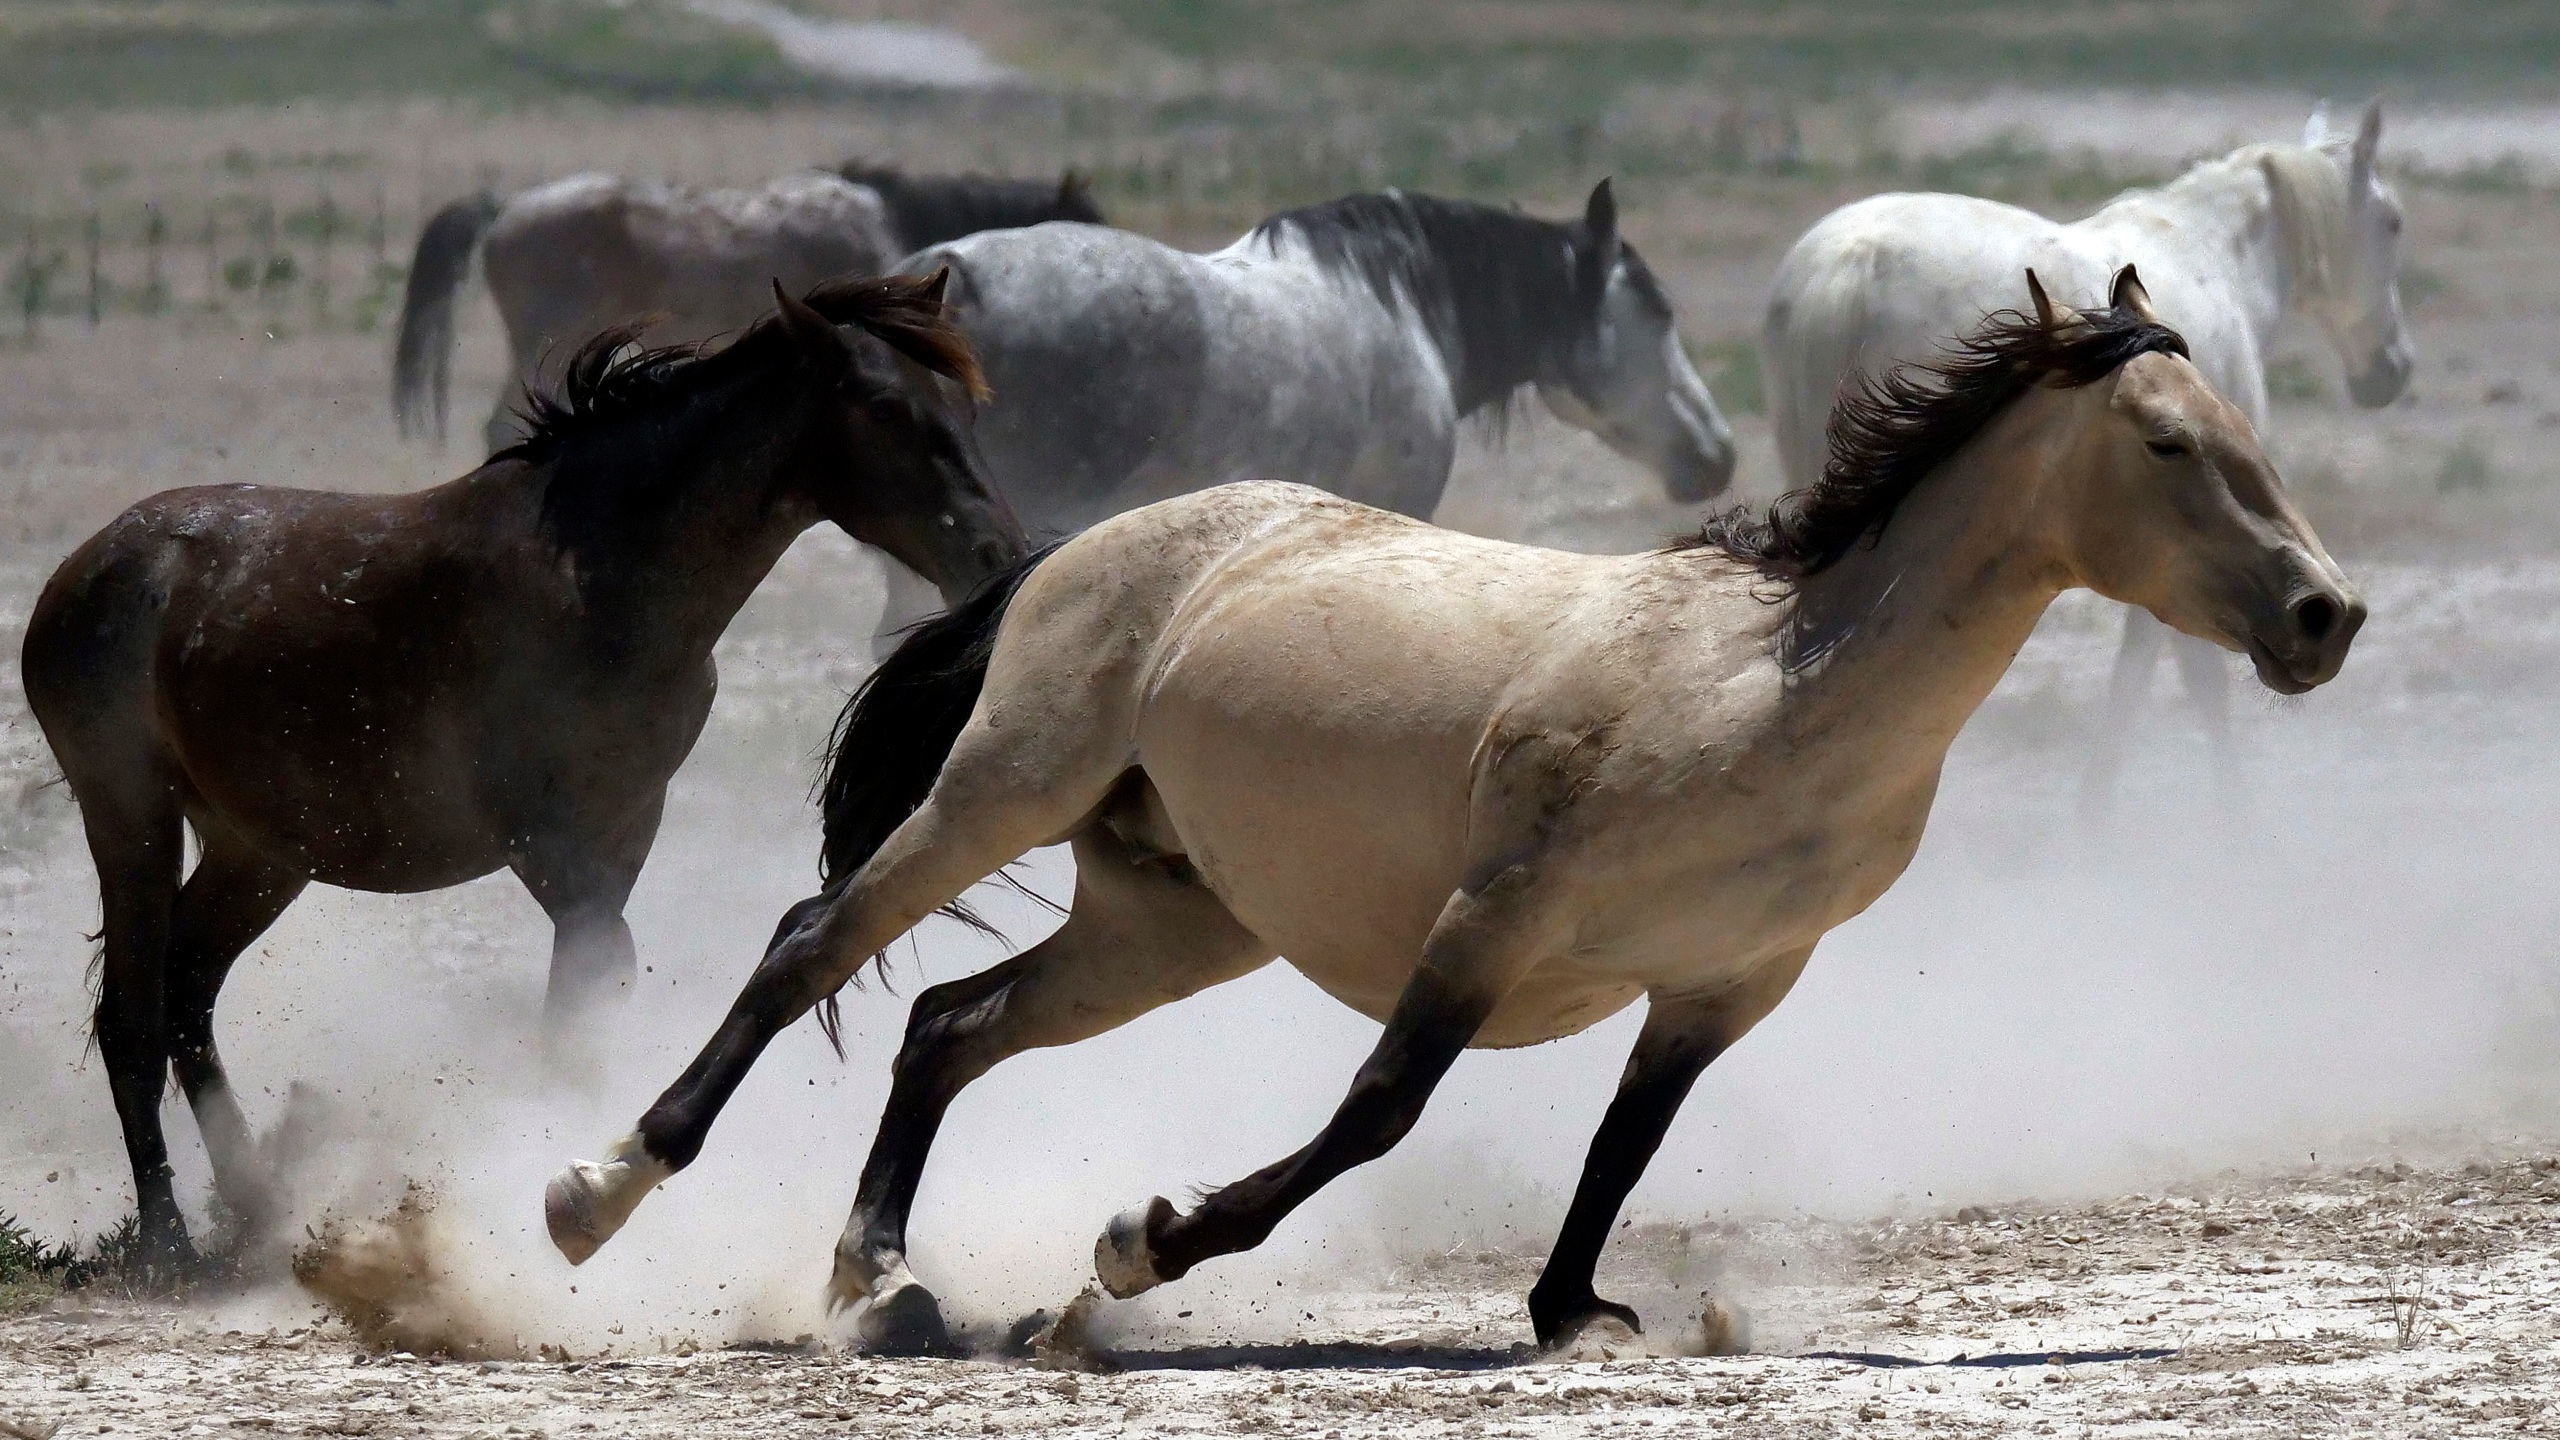 Wild_Horses_Drought_31432-159532.jpg25973757